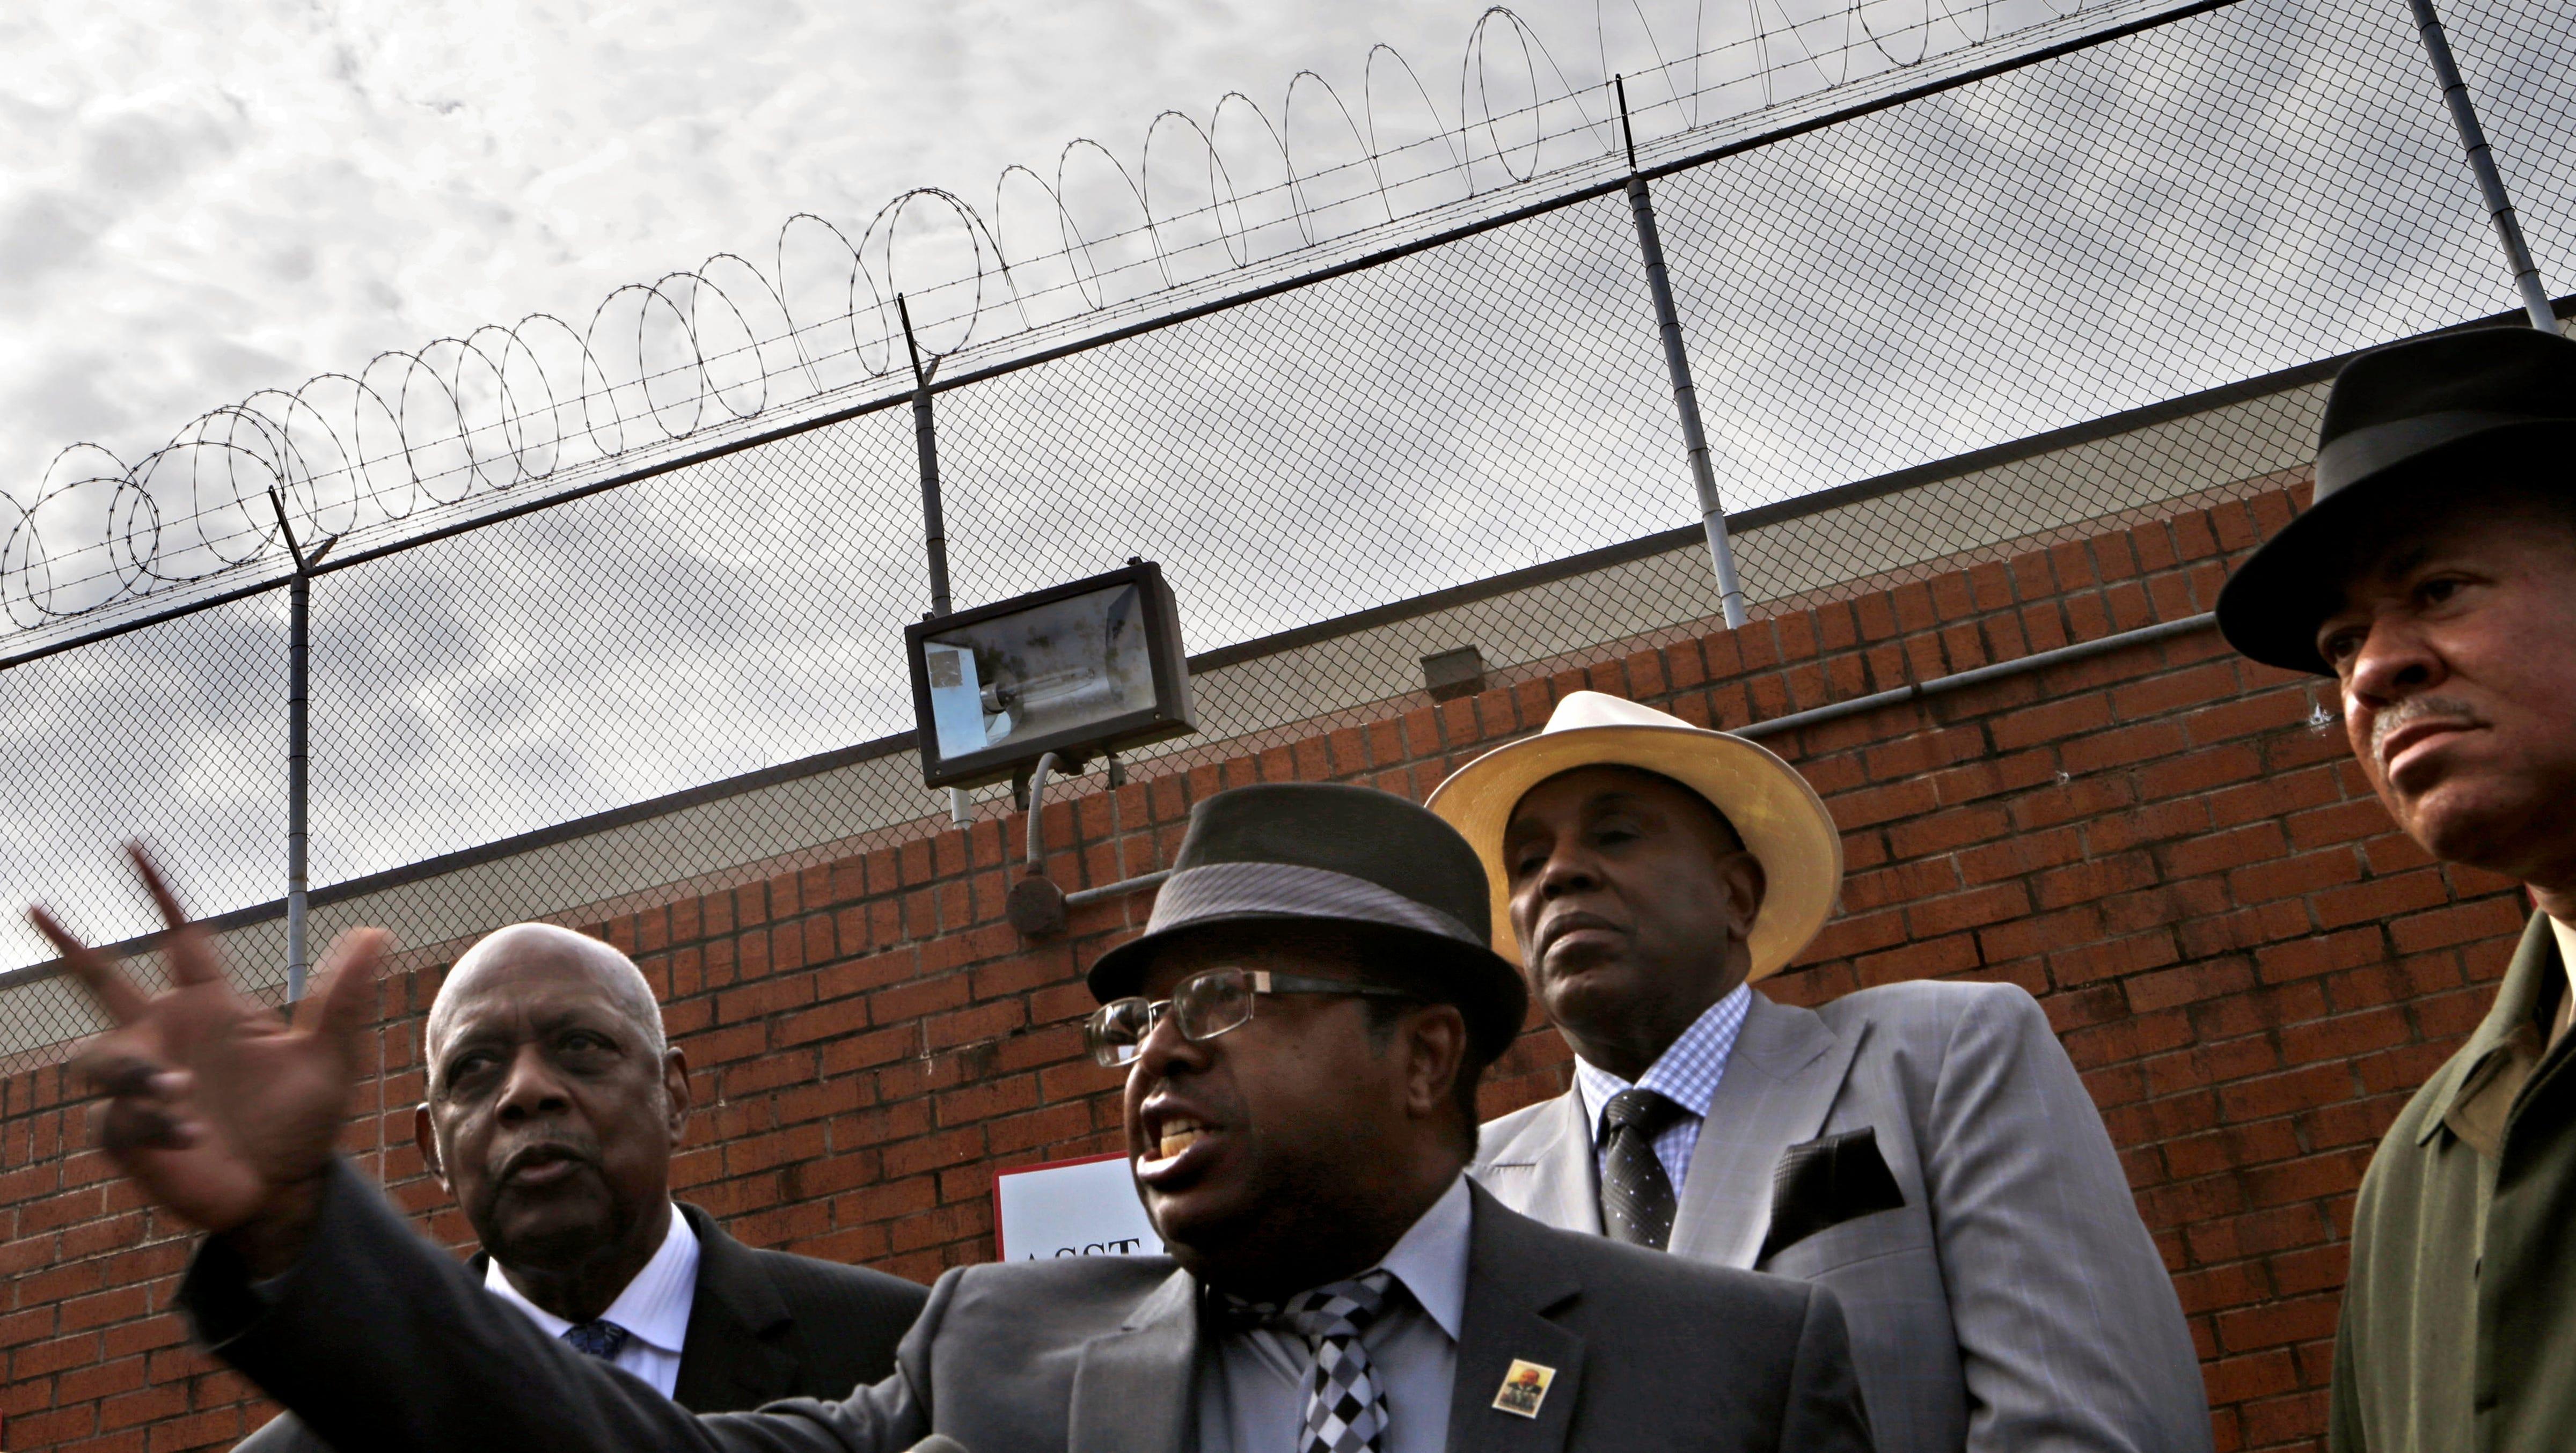 Cheating Case In Atlanta : School cheating scandal shakes up atlanta